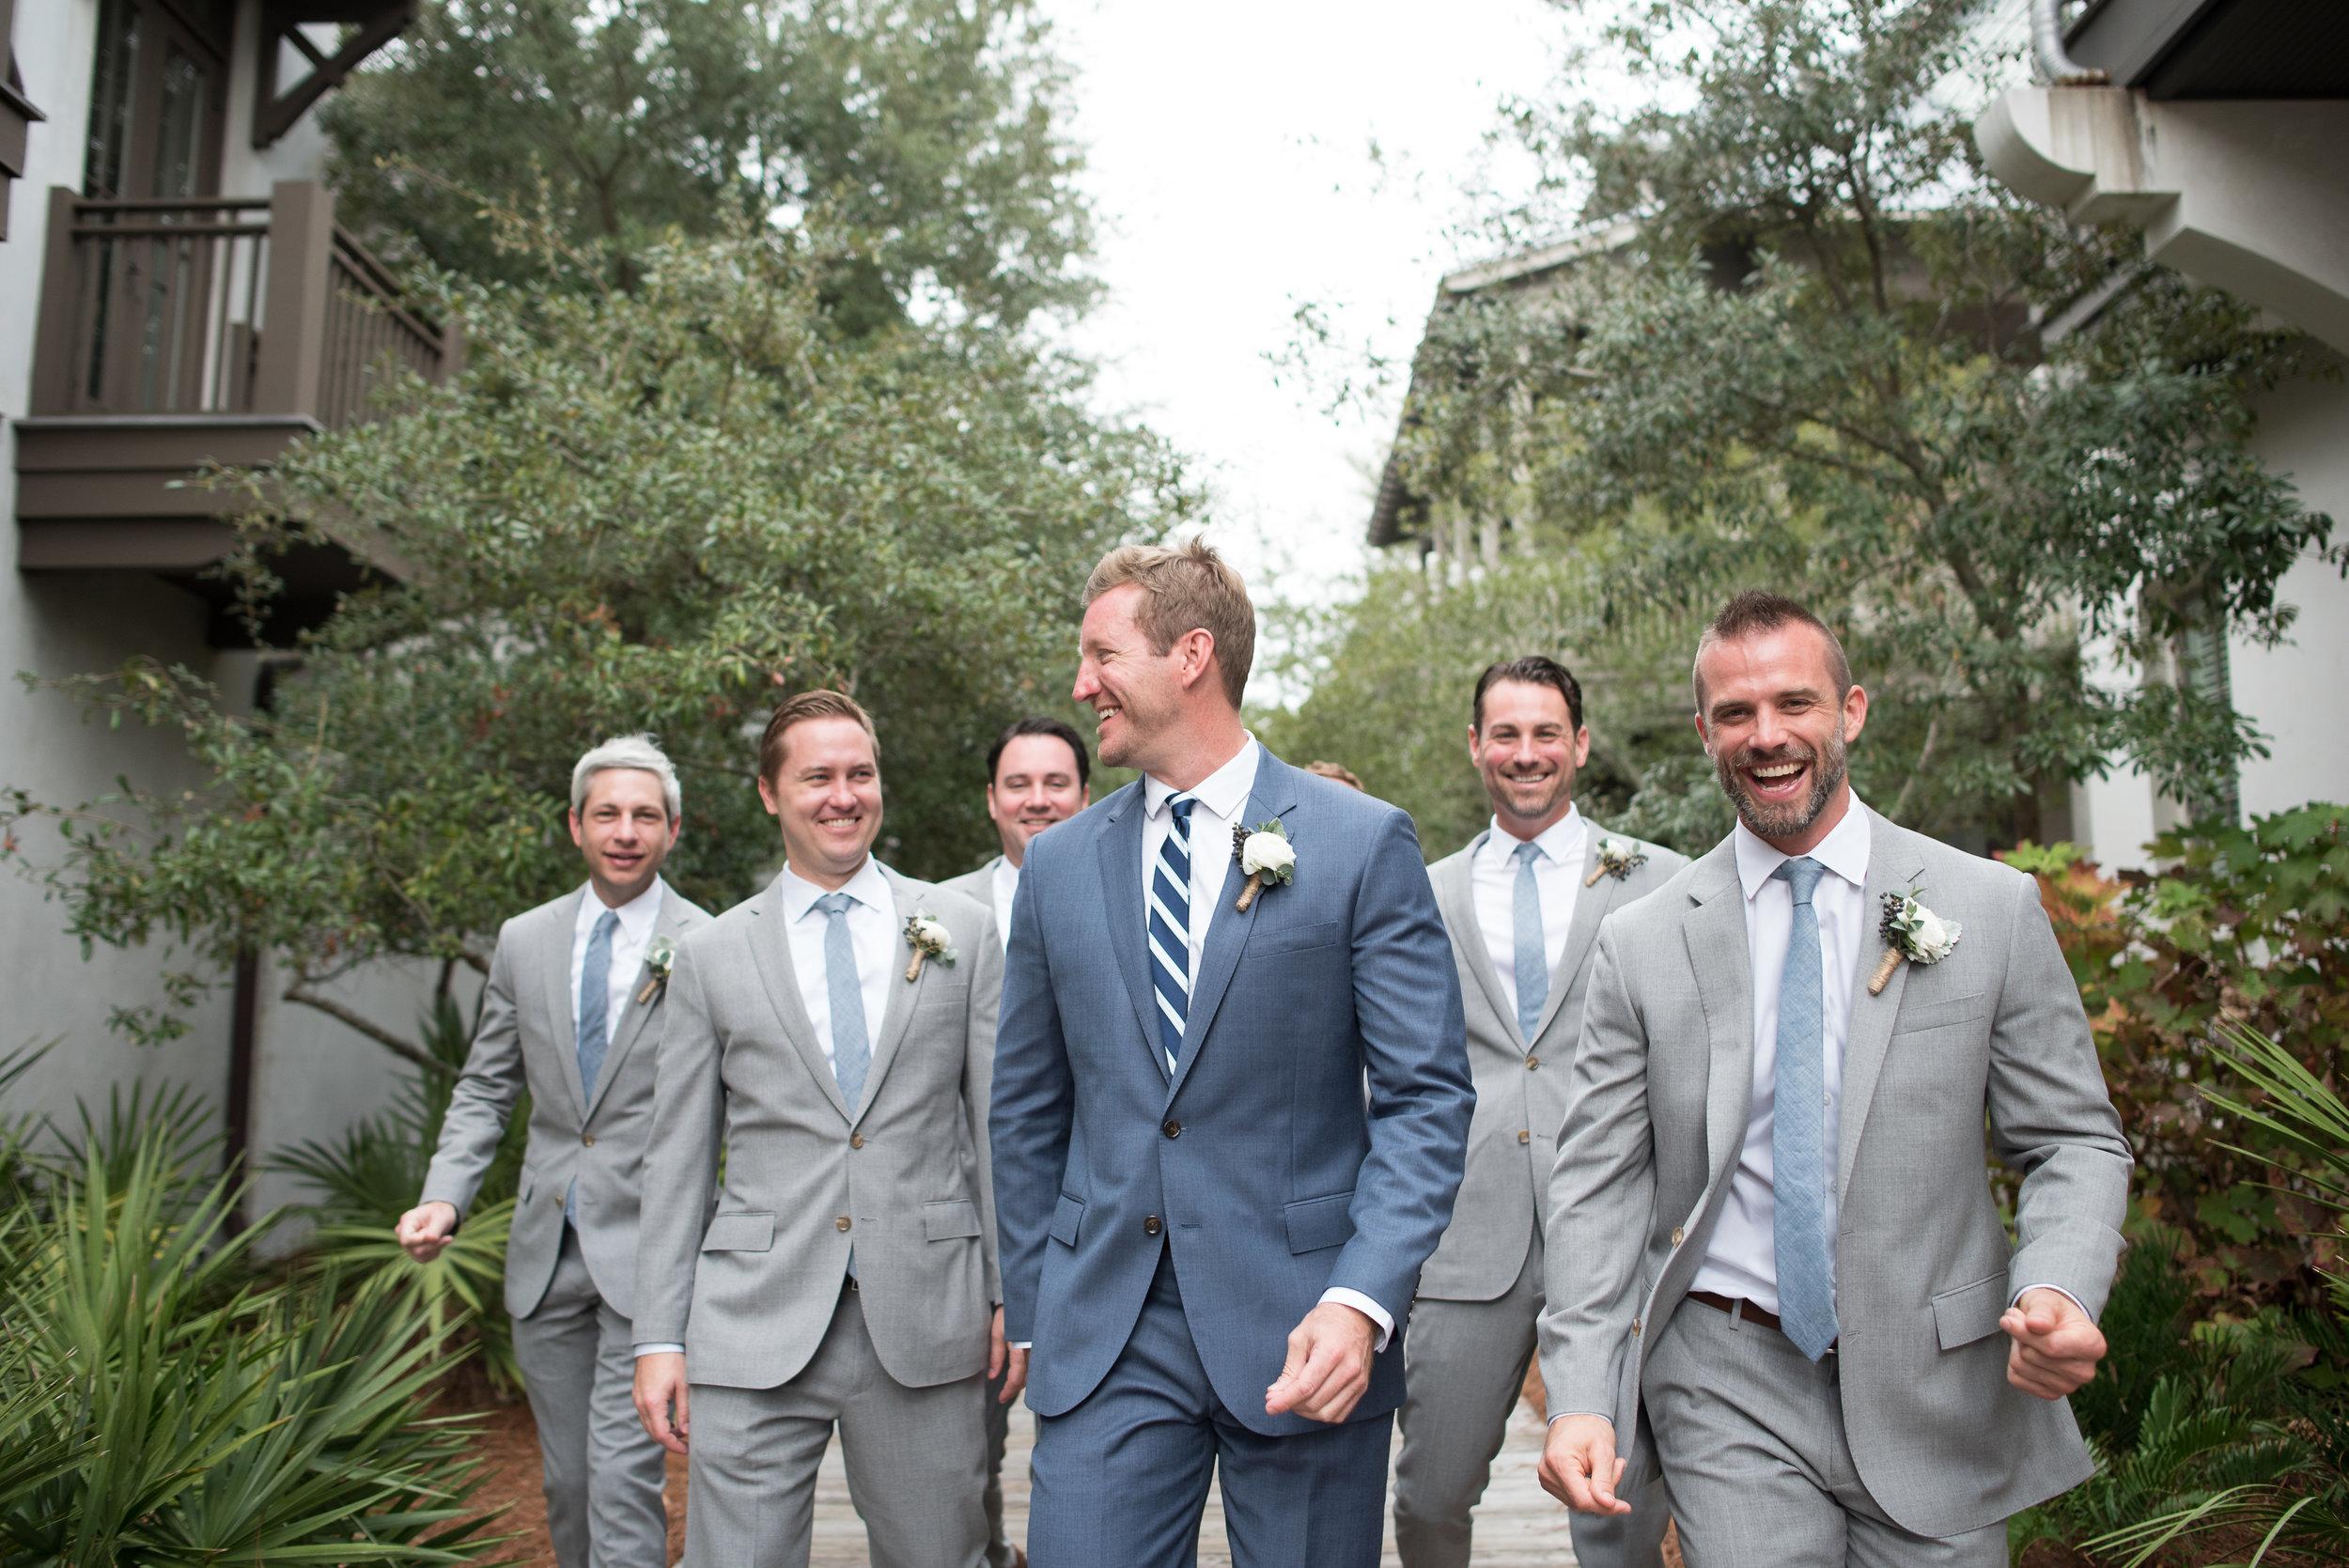 Groom with his groomsmen in Rosemary Beach, Florida wedding.